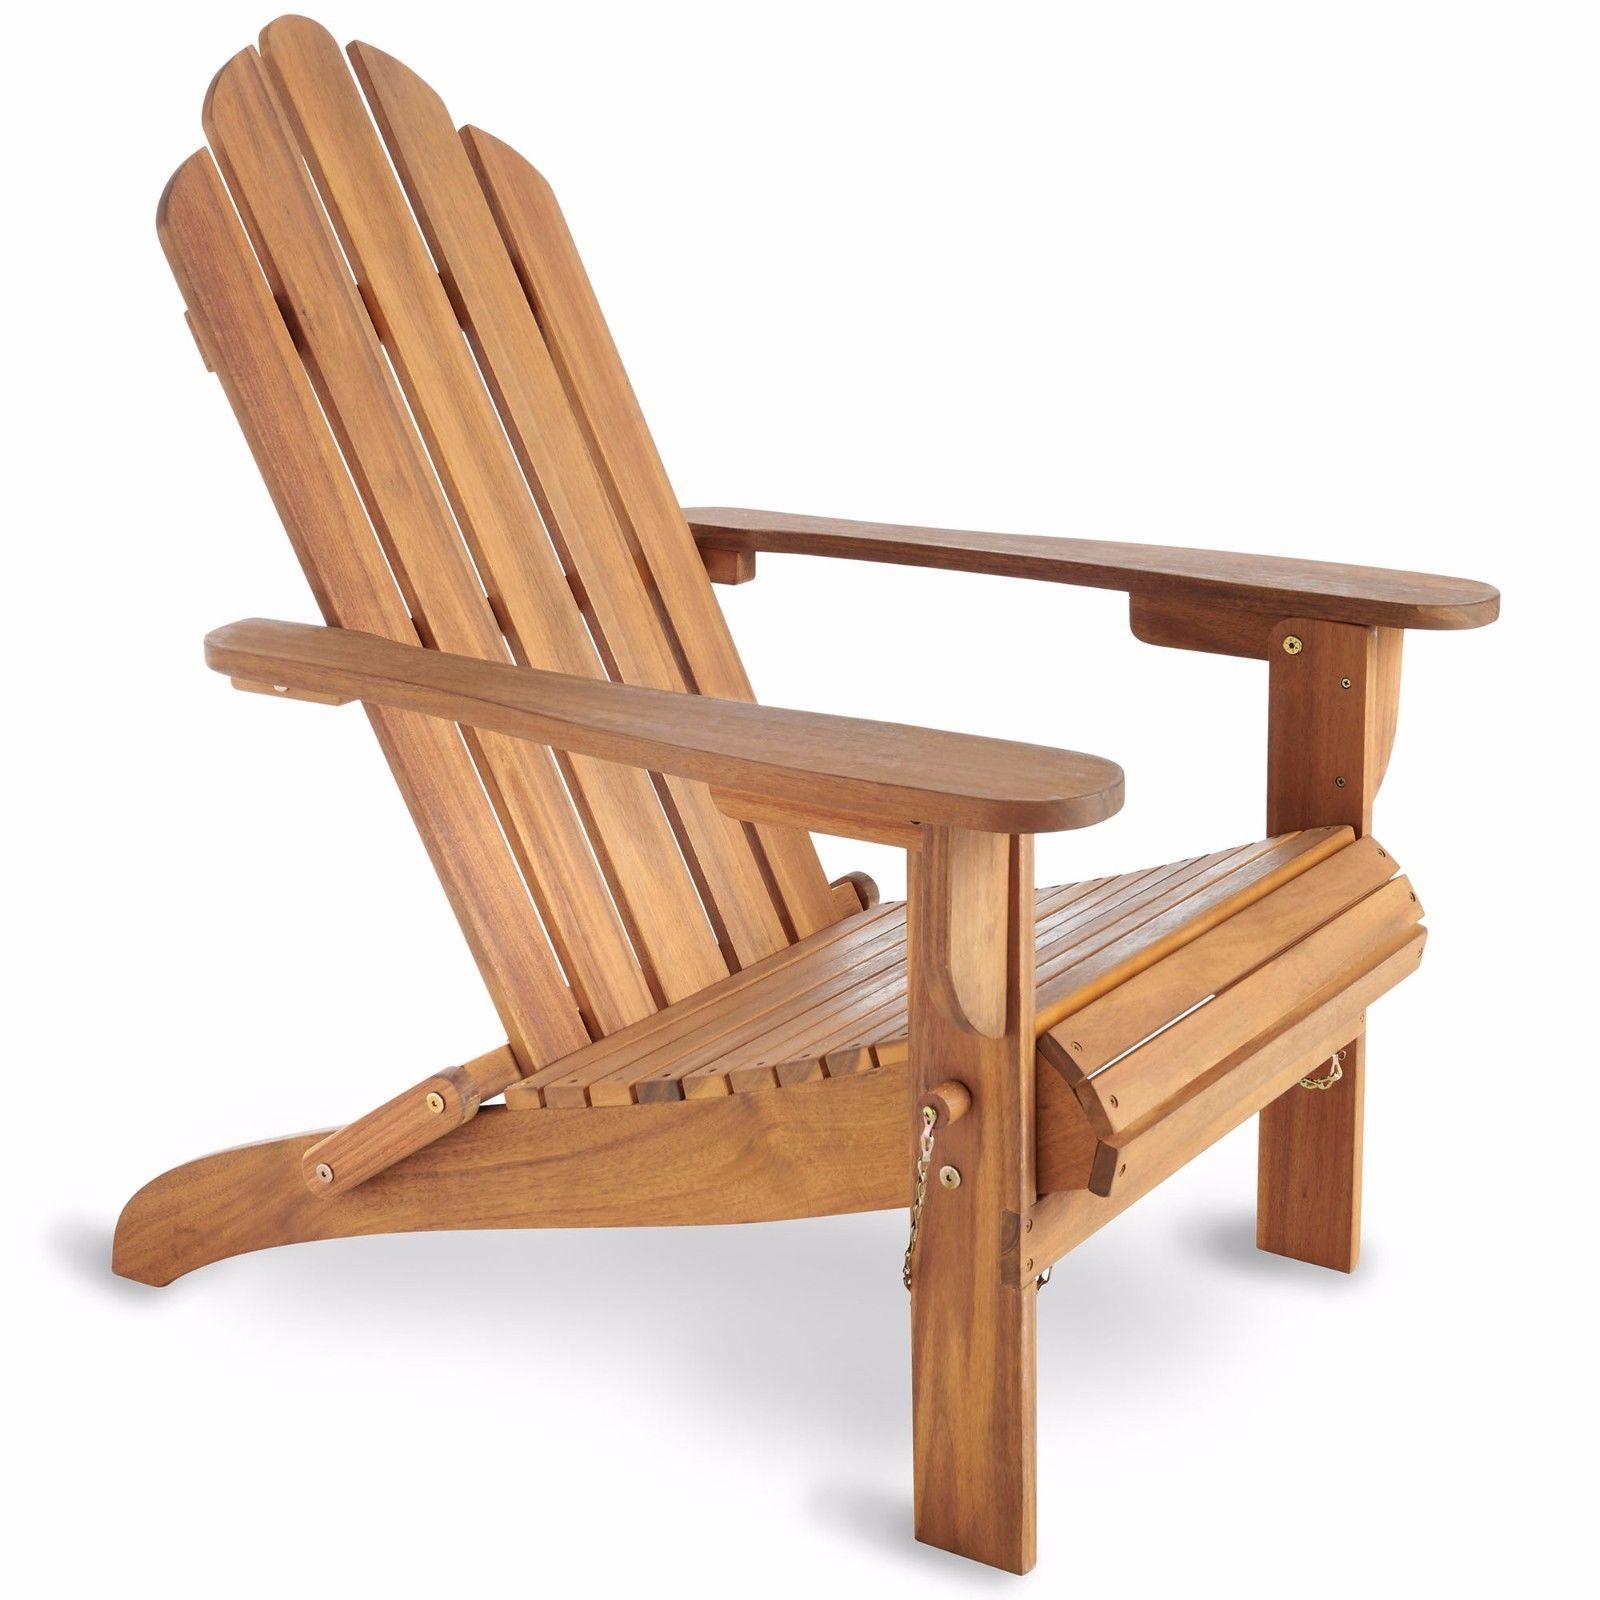 vonhaus folding adirondack chair outdoor garden patio. Black Bedroom Furniture Sets. Home Design Ideas